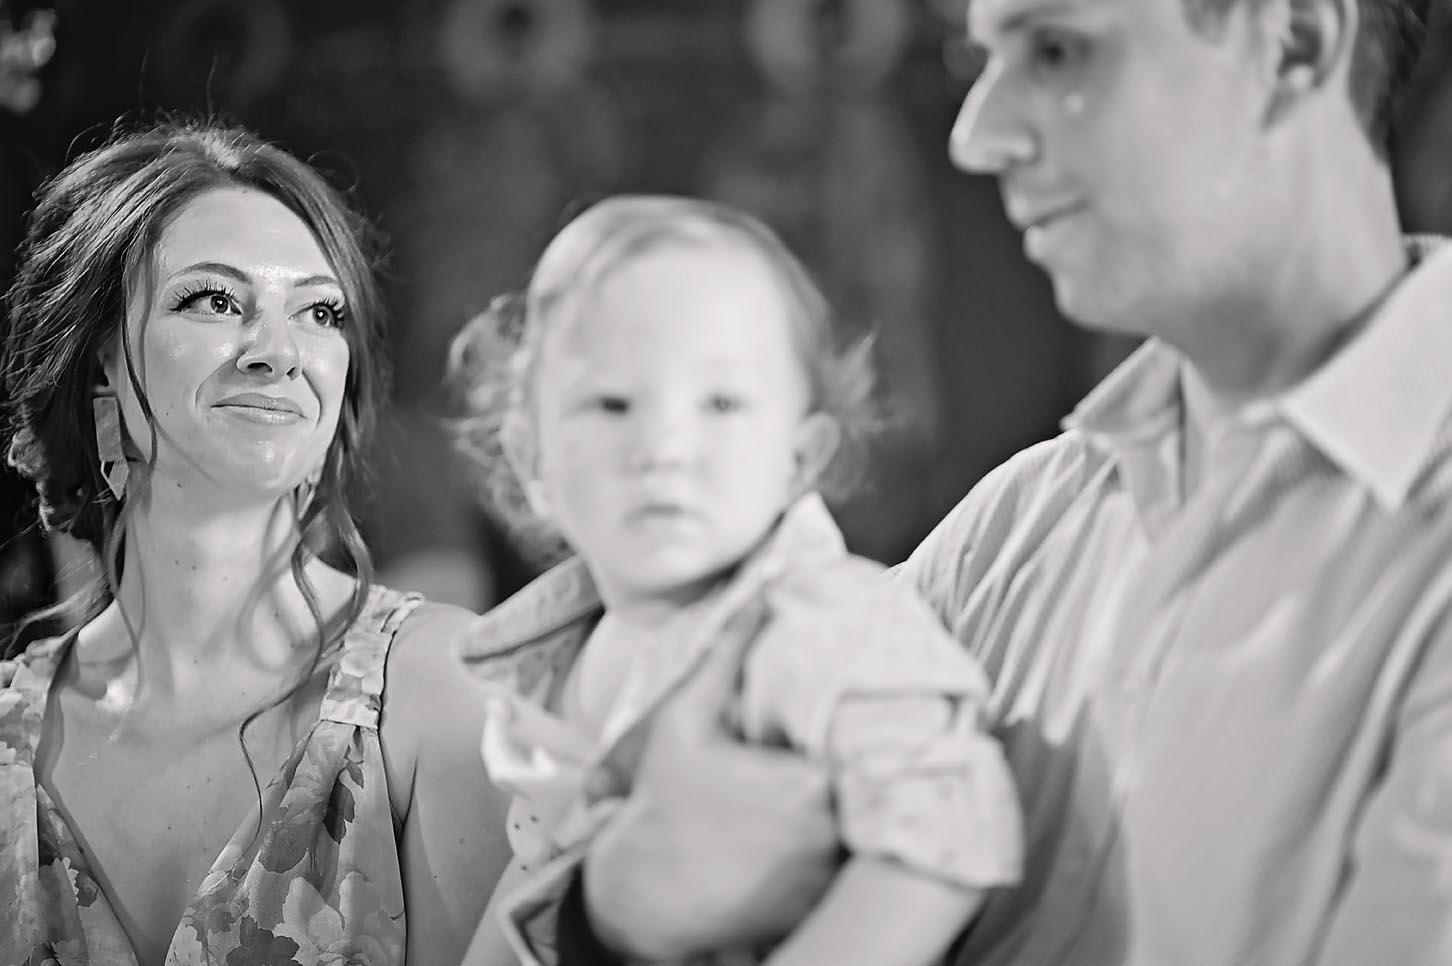 baptism- vchristening- family-potrtait-alexis-koumaditis-larissa-01